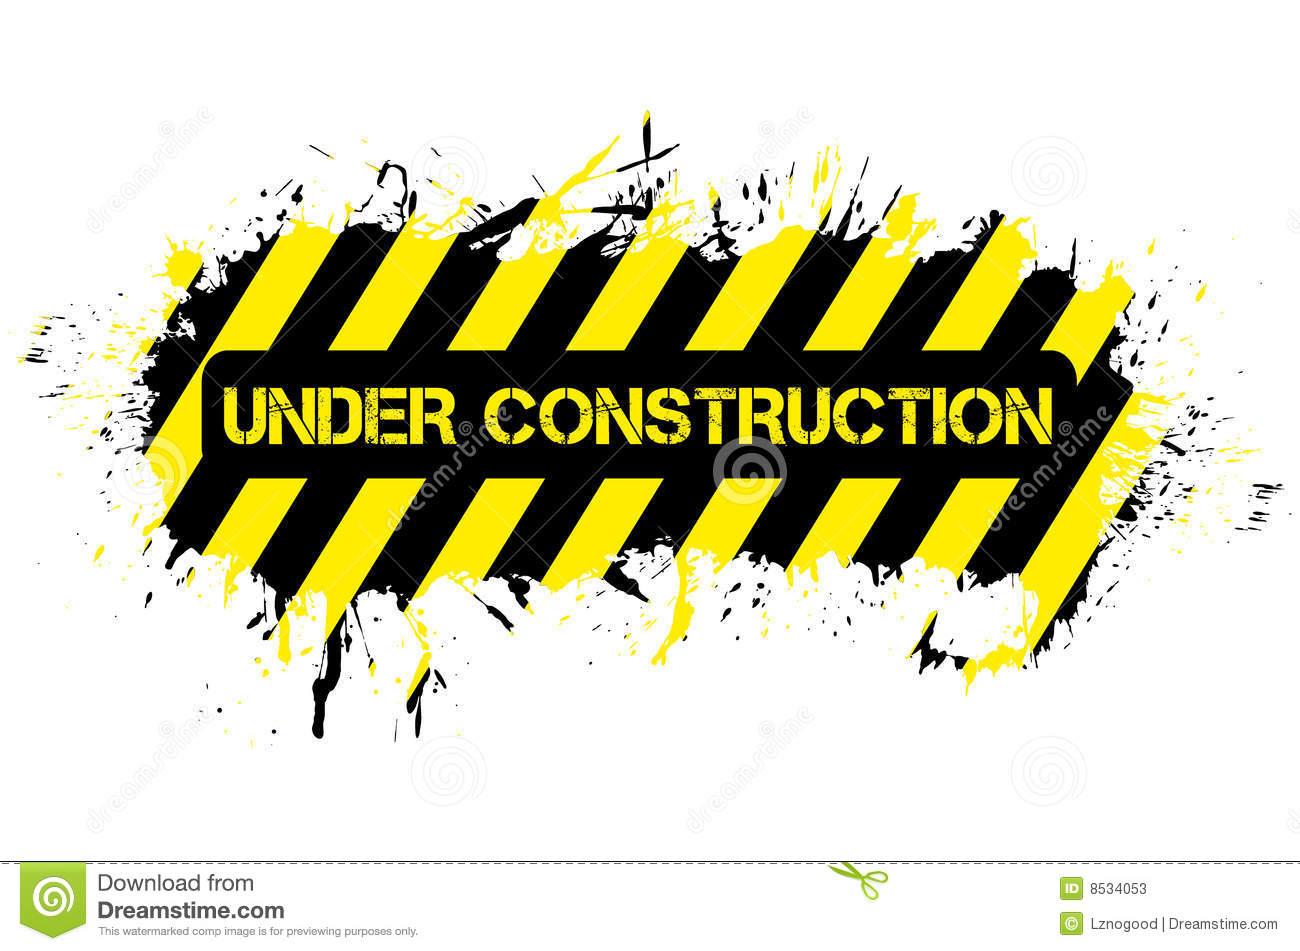 Grunge under construction stock vector. Illustration of estate.